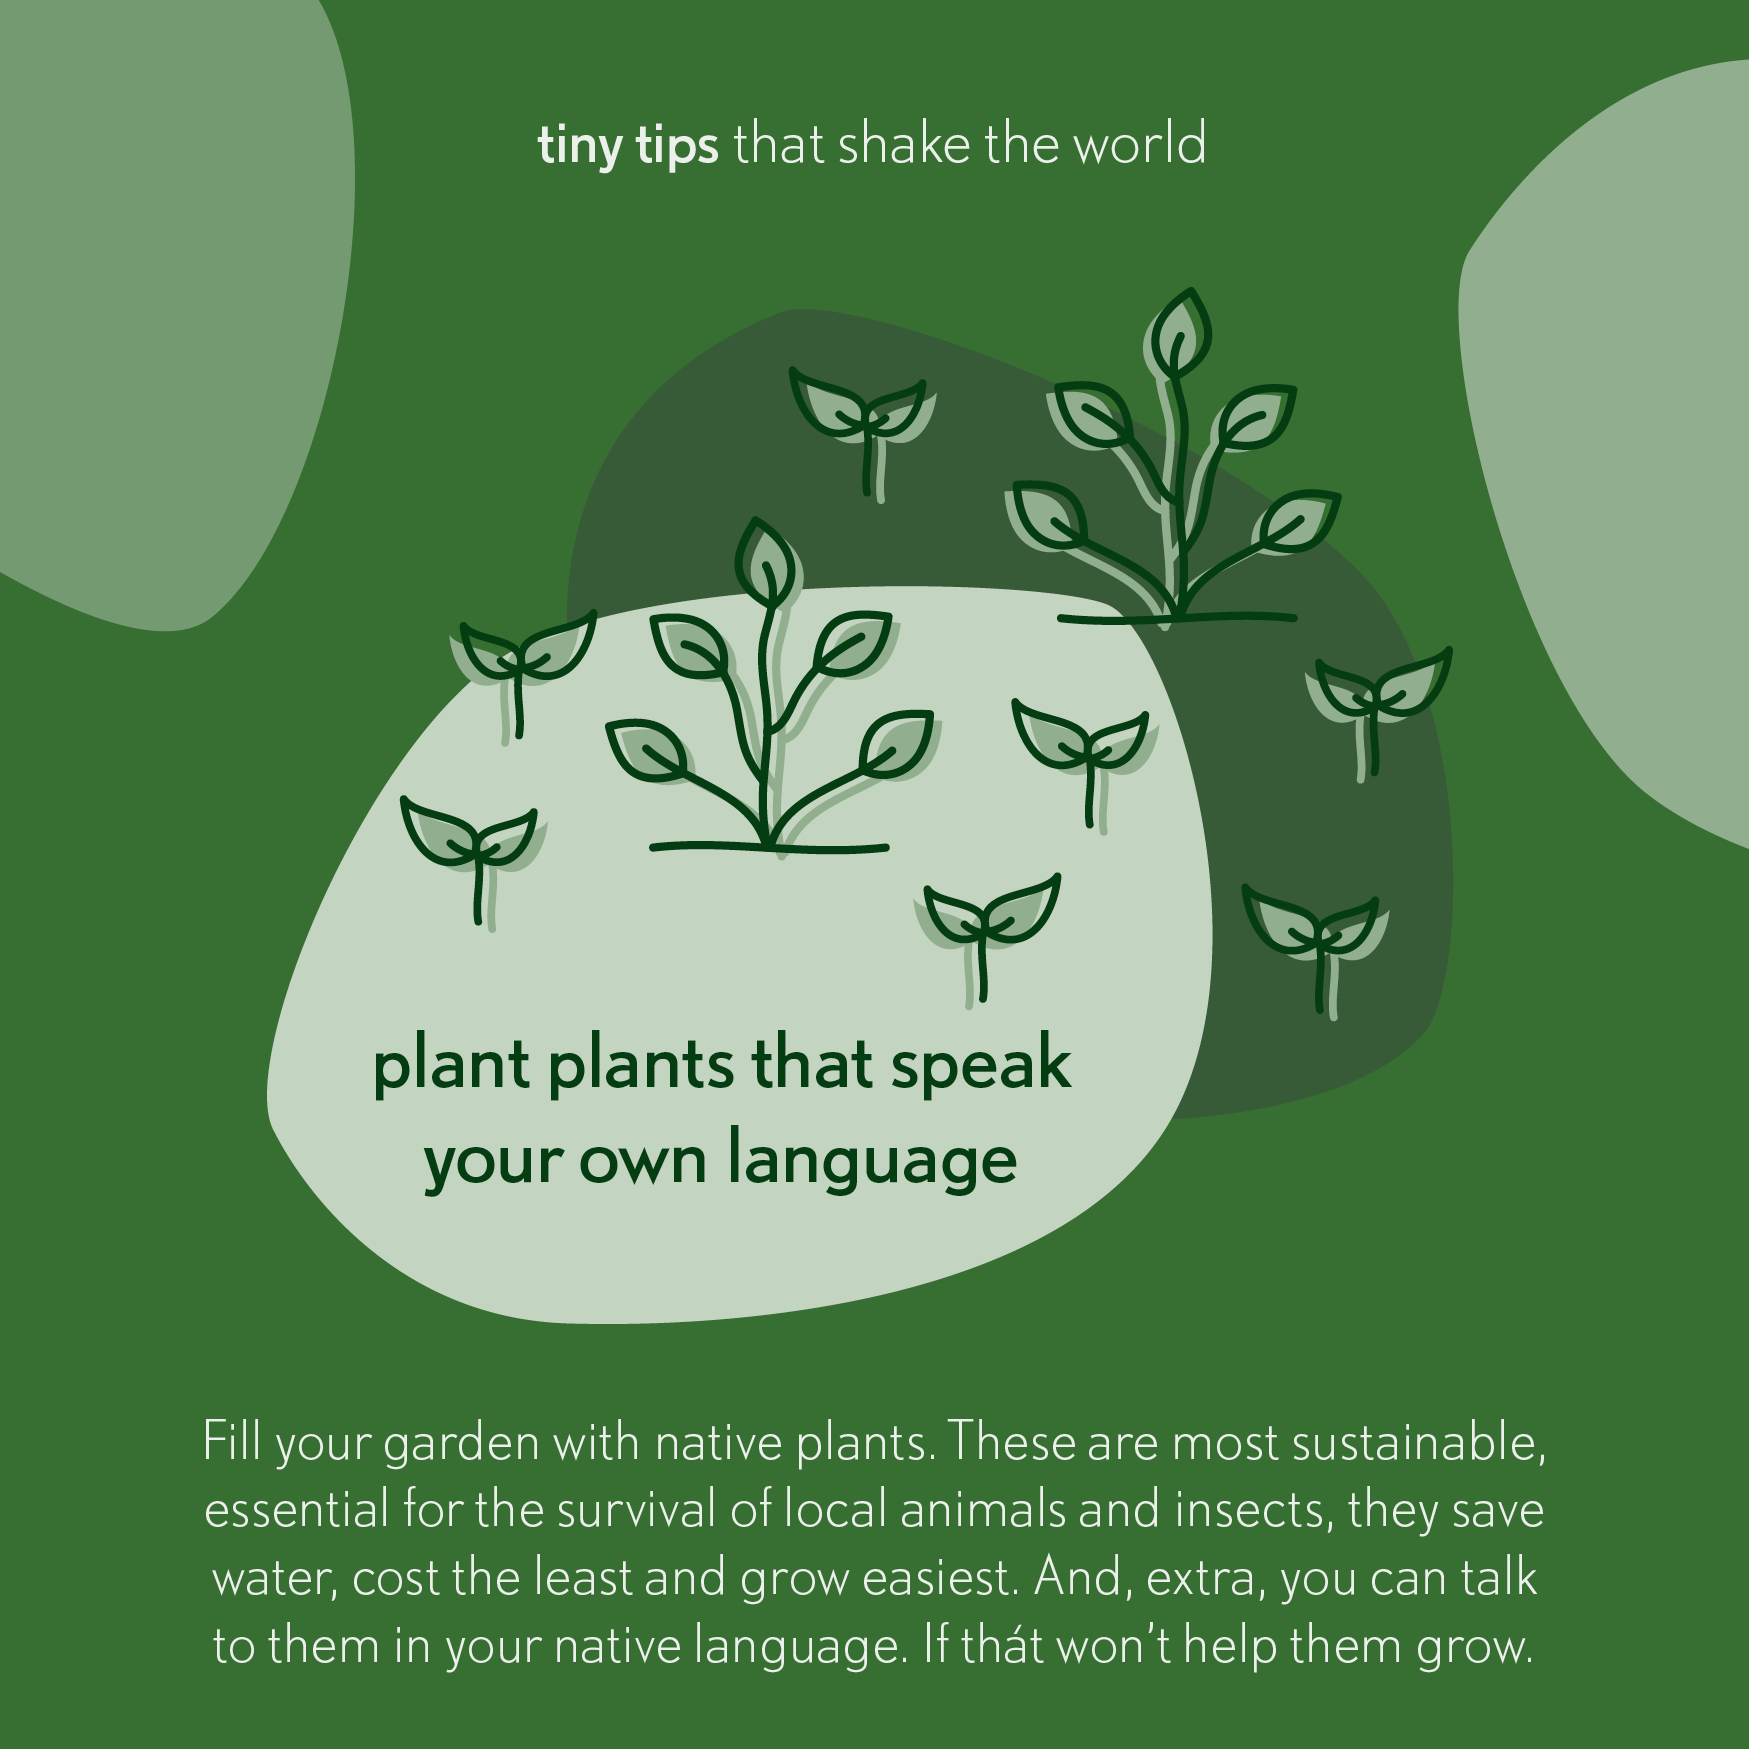 20190414 Plant plants that speak your own language